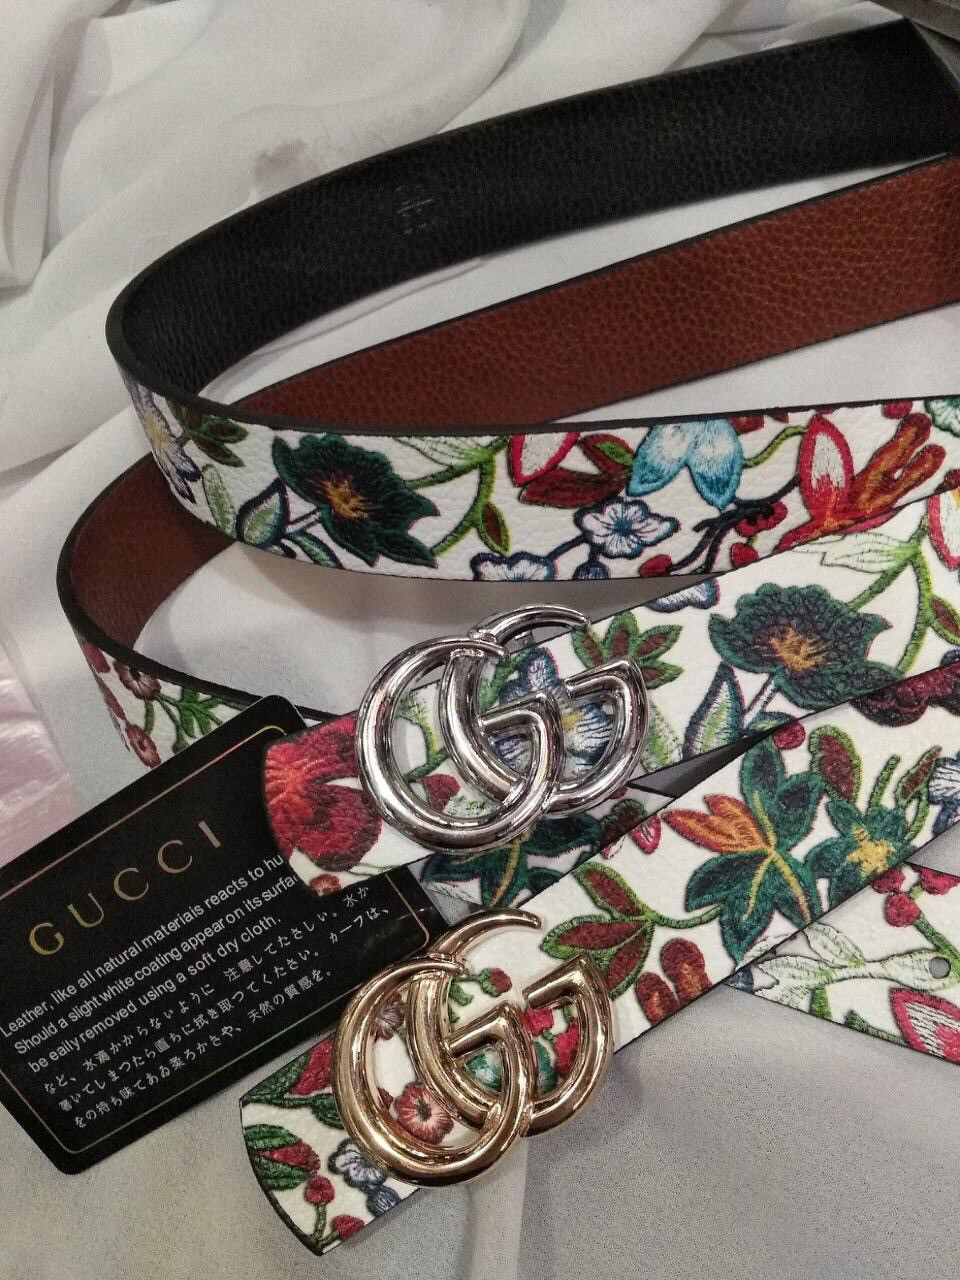 Ремень Gucci двусторонний  (реплика Гучи) color 2